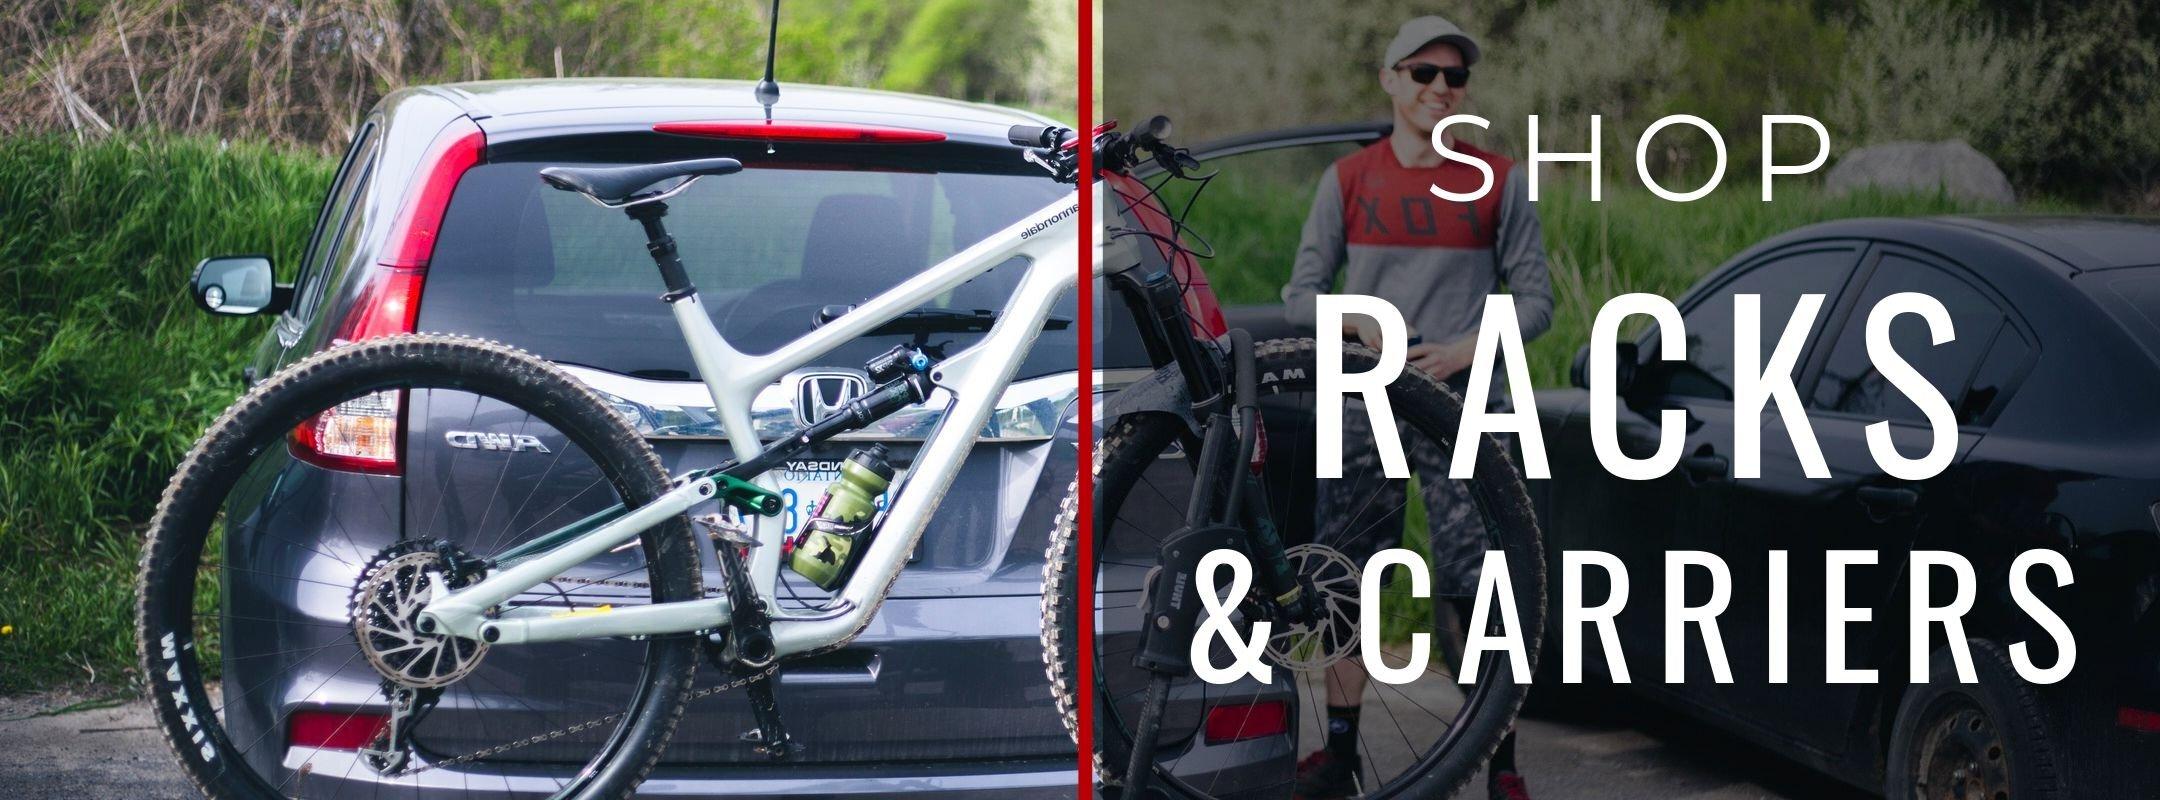 SHOP CAR RACKS & CARRIERS